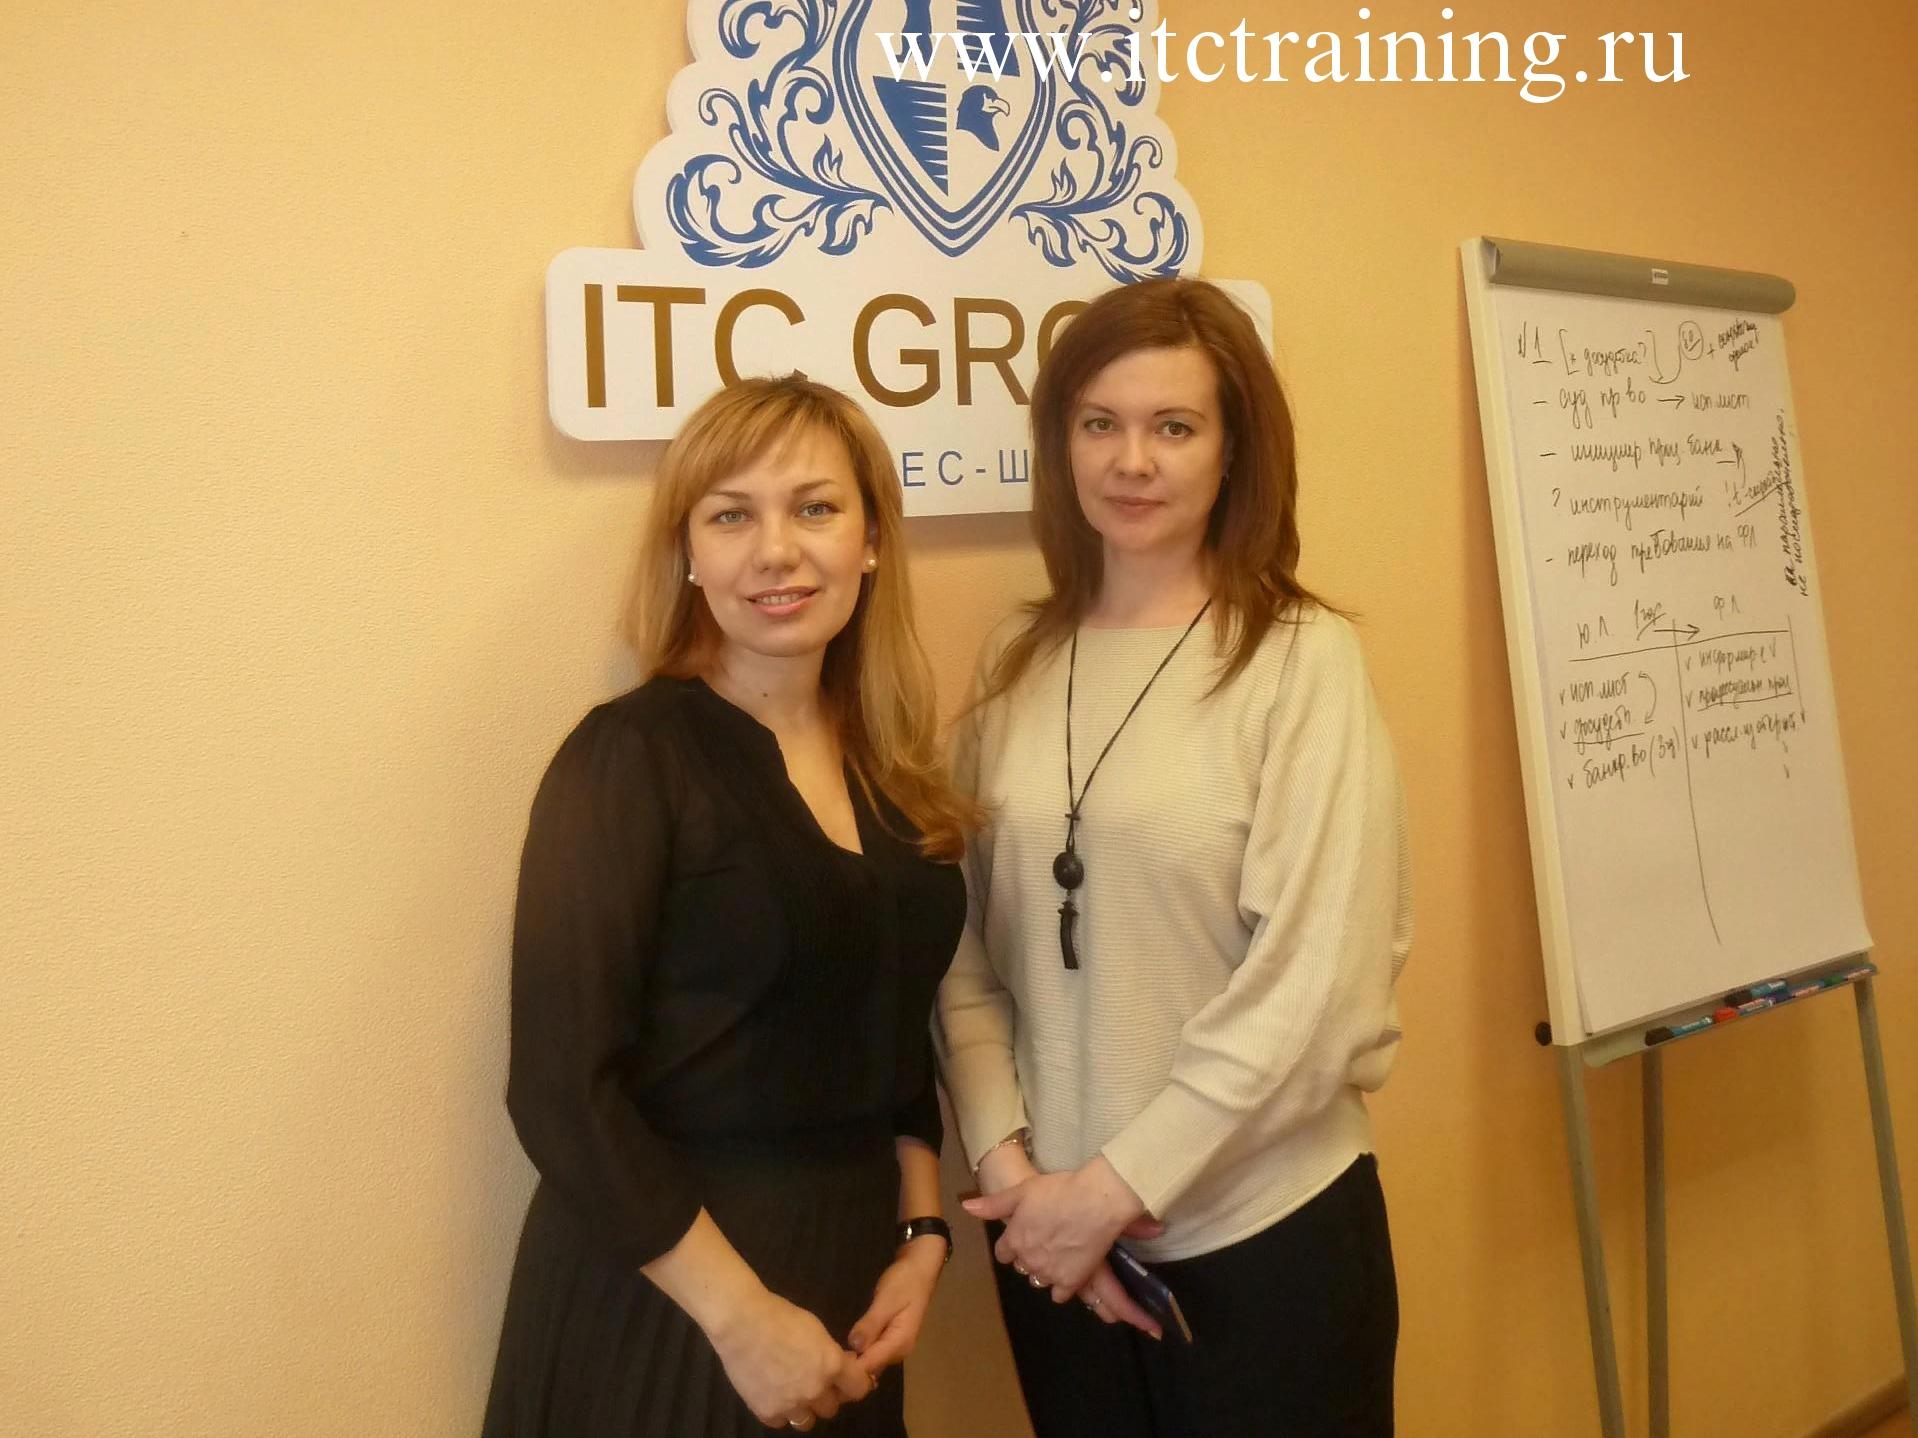 семинары банкротство москва